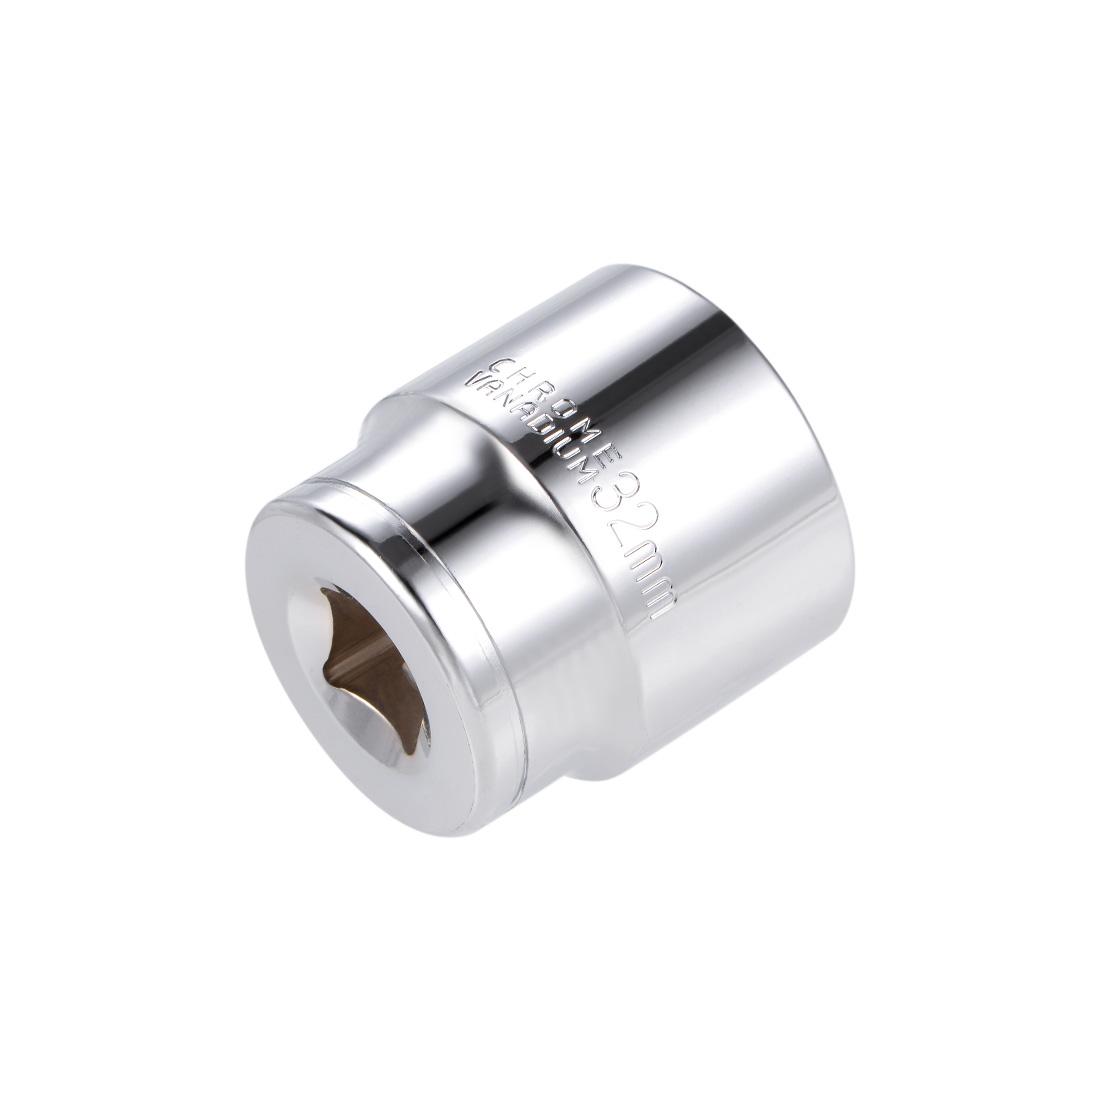 1/2-inch Drive E32 Universal Spline Socket Shallow 12 Point Cr-V Steel